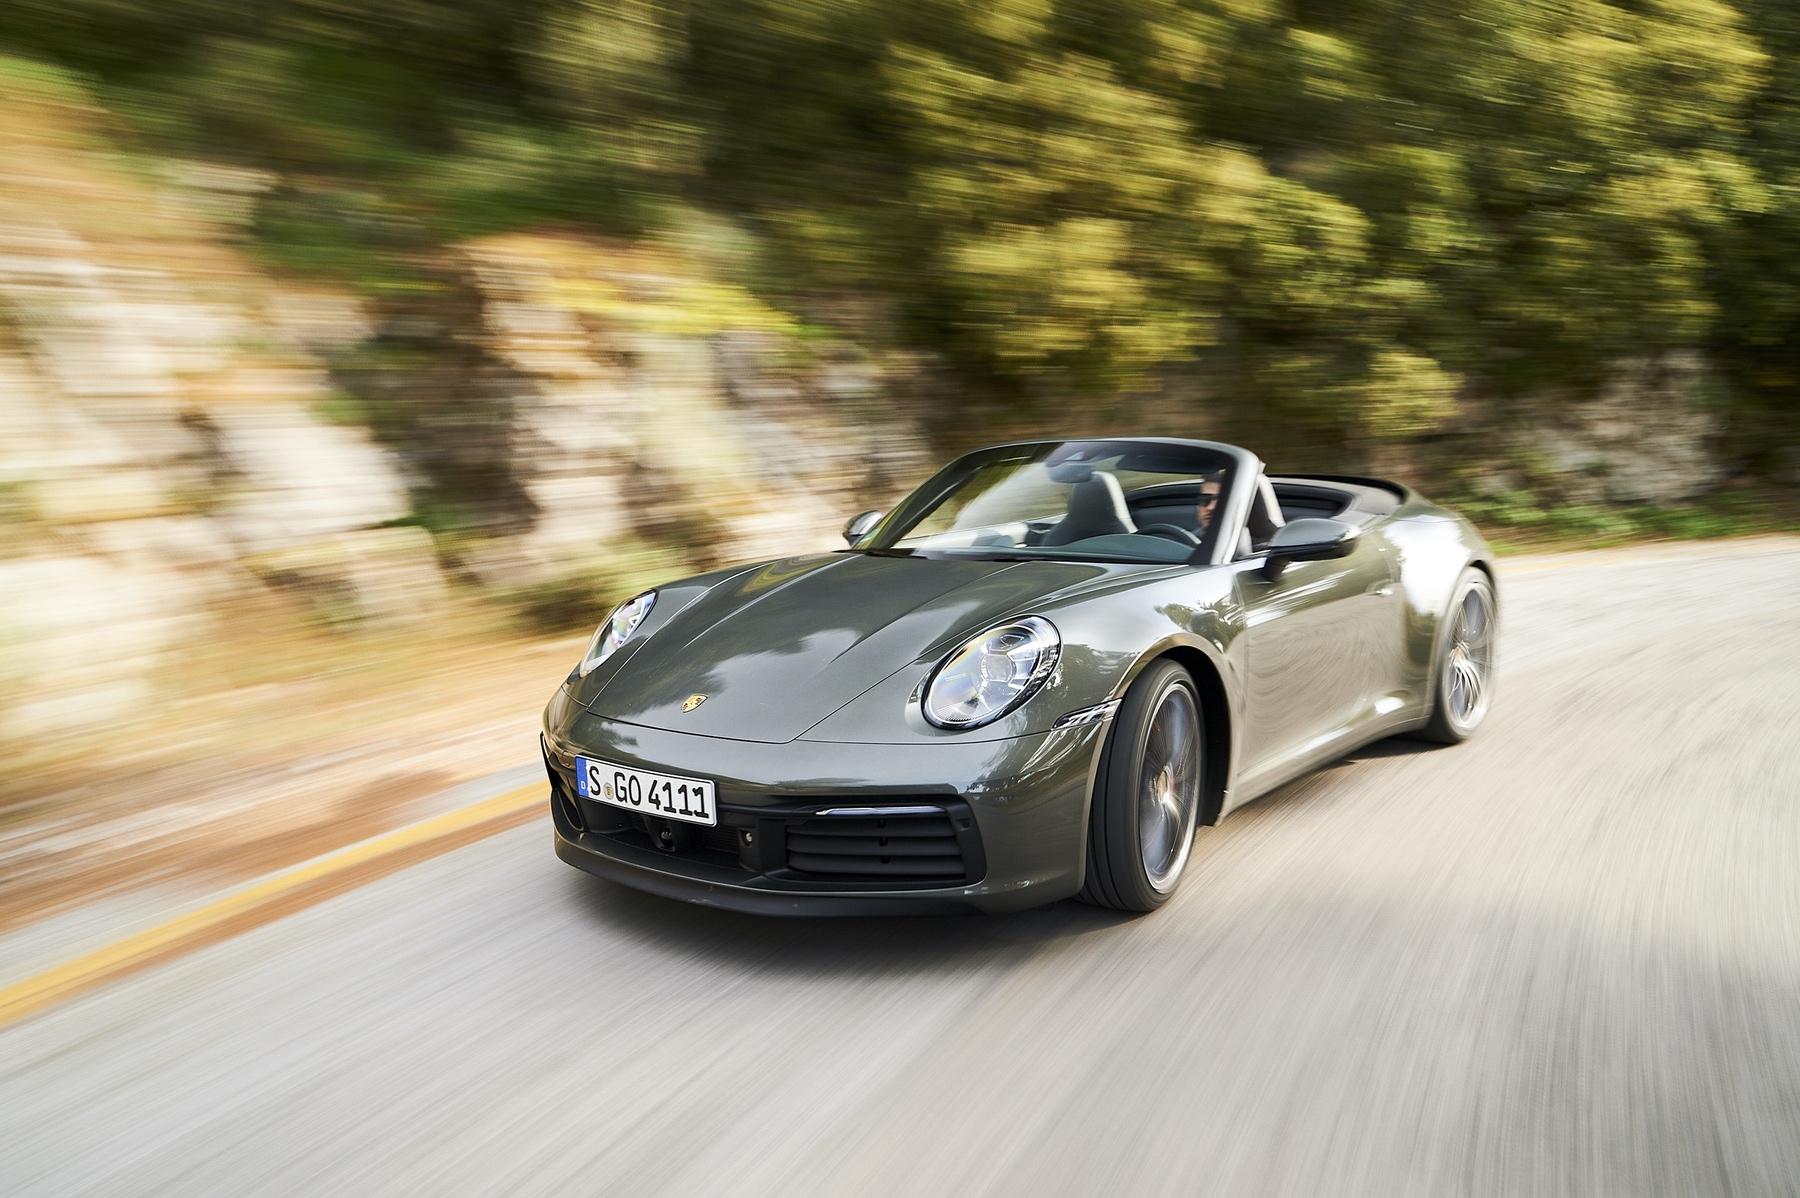 Test_Drive_Porsche_911_Athens_0106